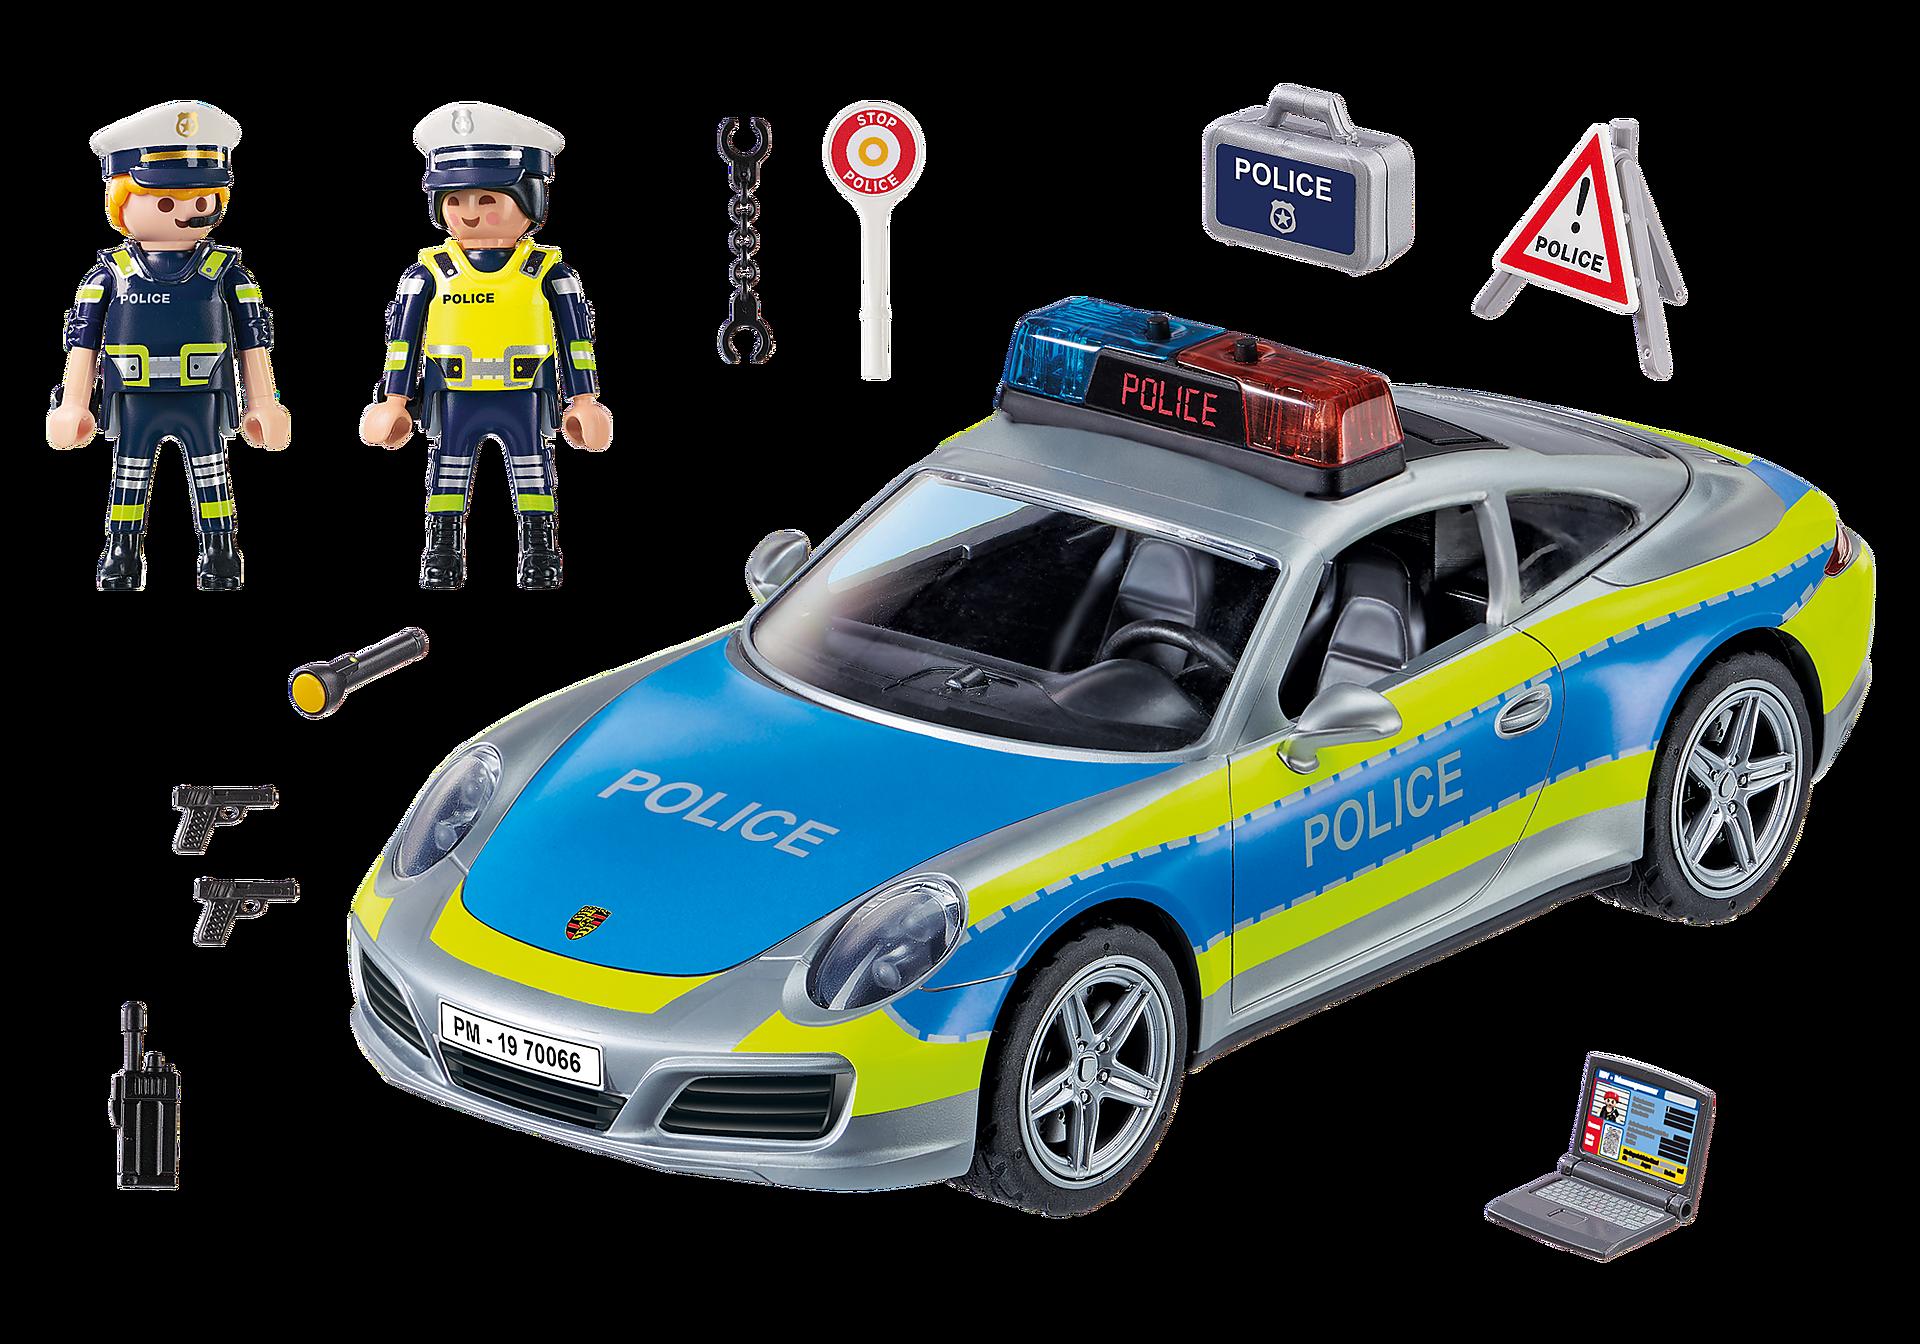 http://media.playmobil.com/i/playmobil/70066_product_box_back/Porsche 911 Carrera 4S Politie